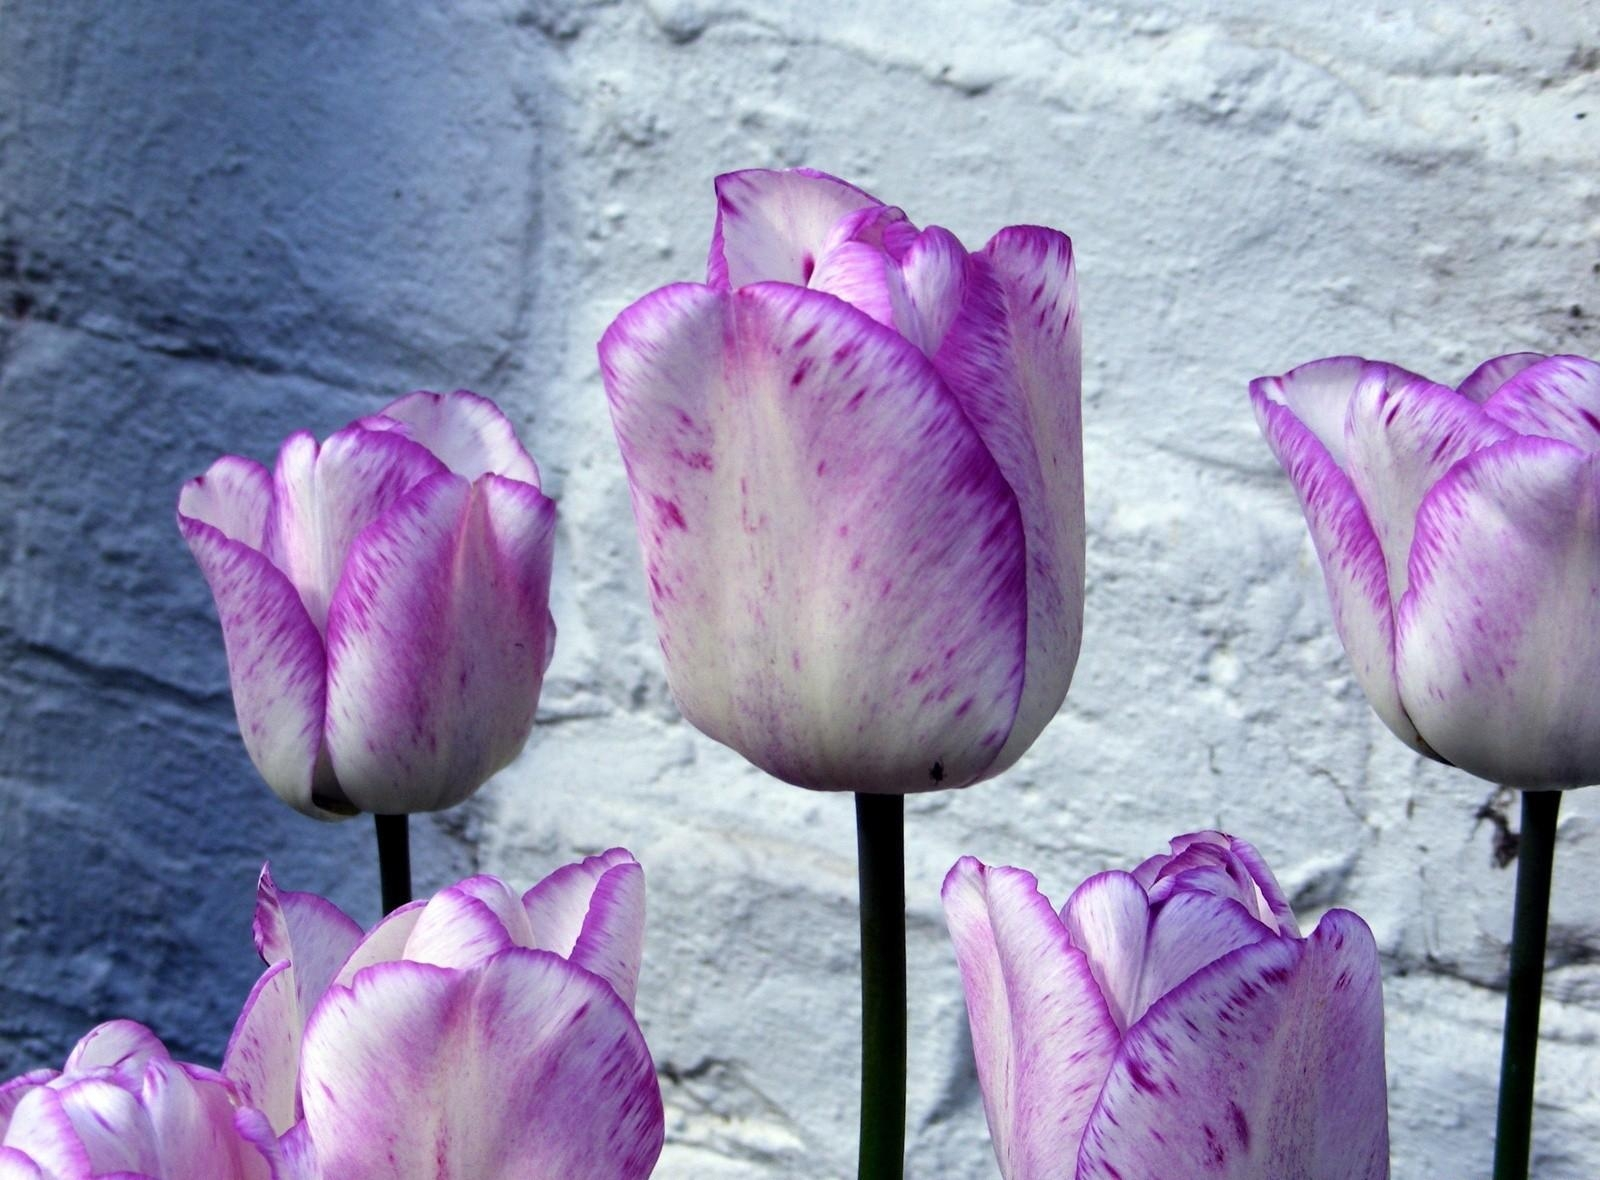 119287 descargar fondo de pantalla Flores, Cogollos, Brotes, Jaspeado, Moteado, Cama De Flores, Parterre, Pared, Tulipanes: protectores de pantalla e imágenes gratis